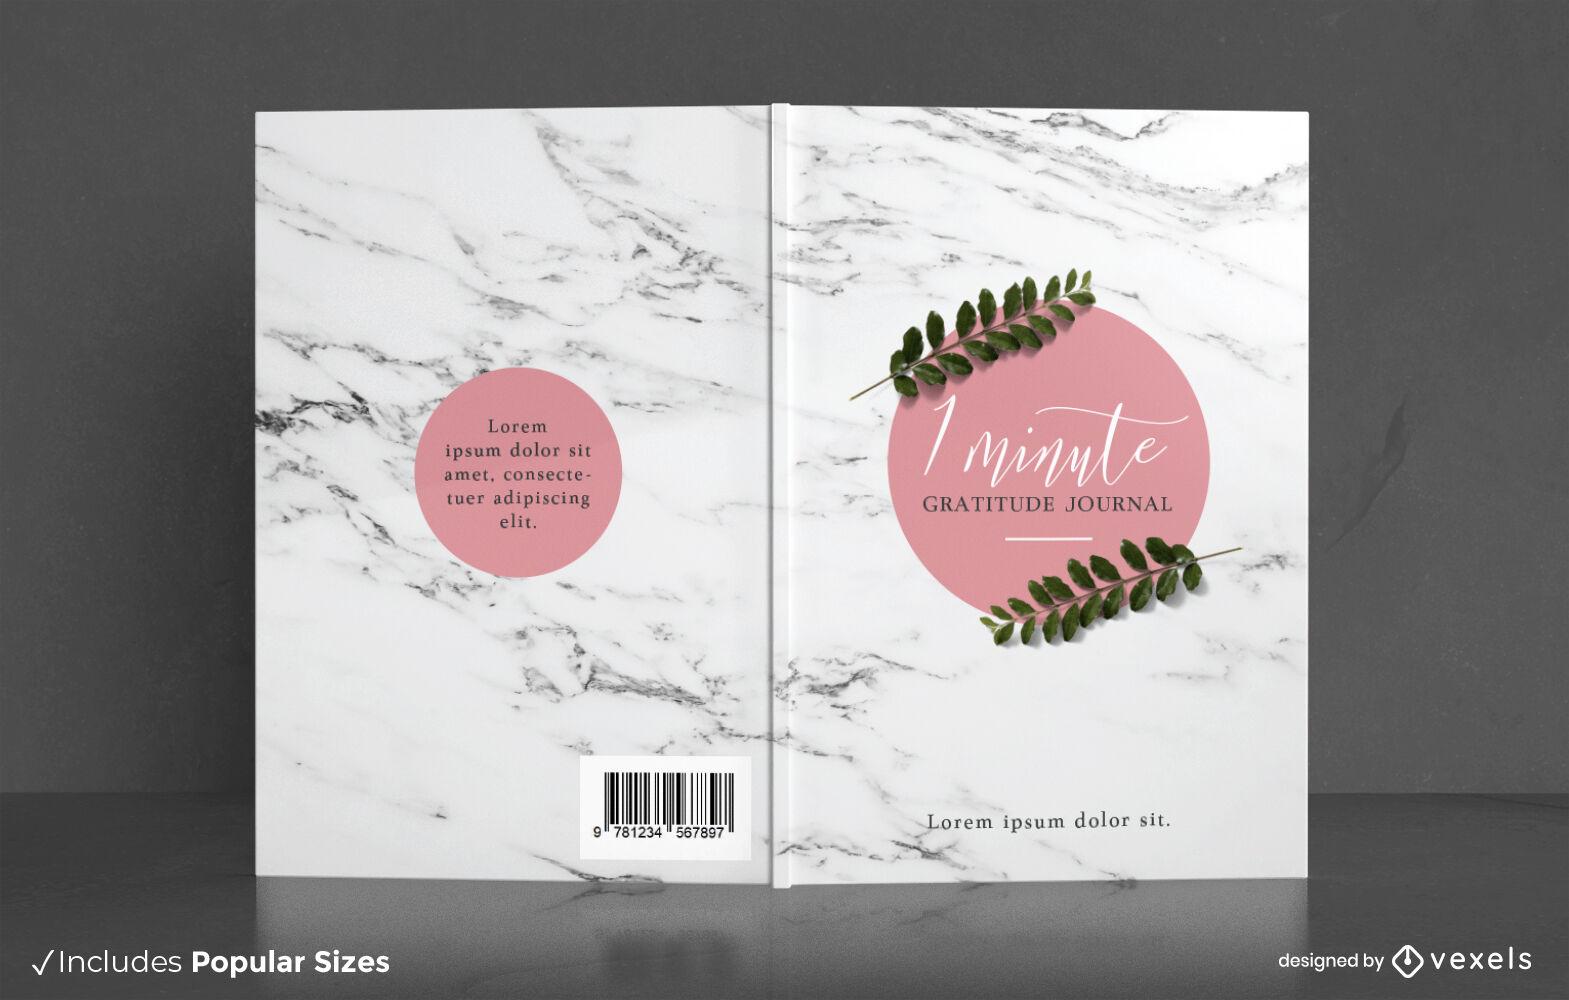 Gratitude journal leaves book cover design